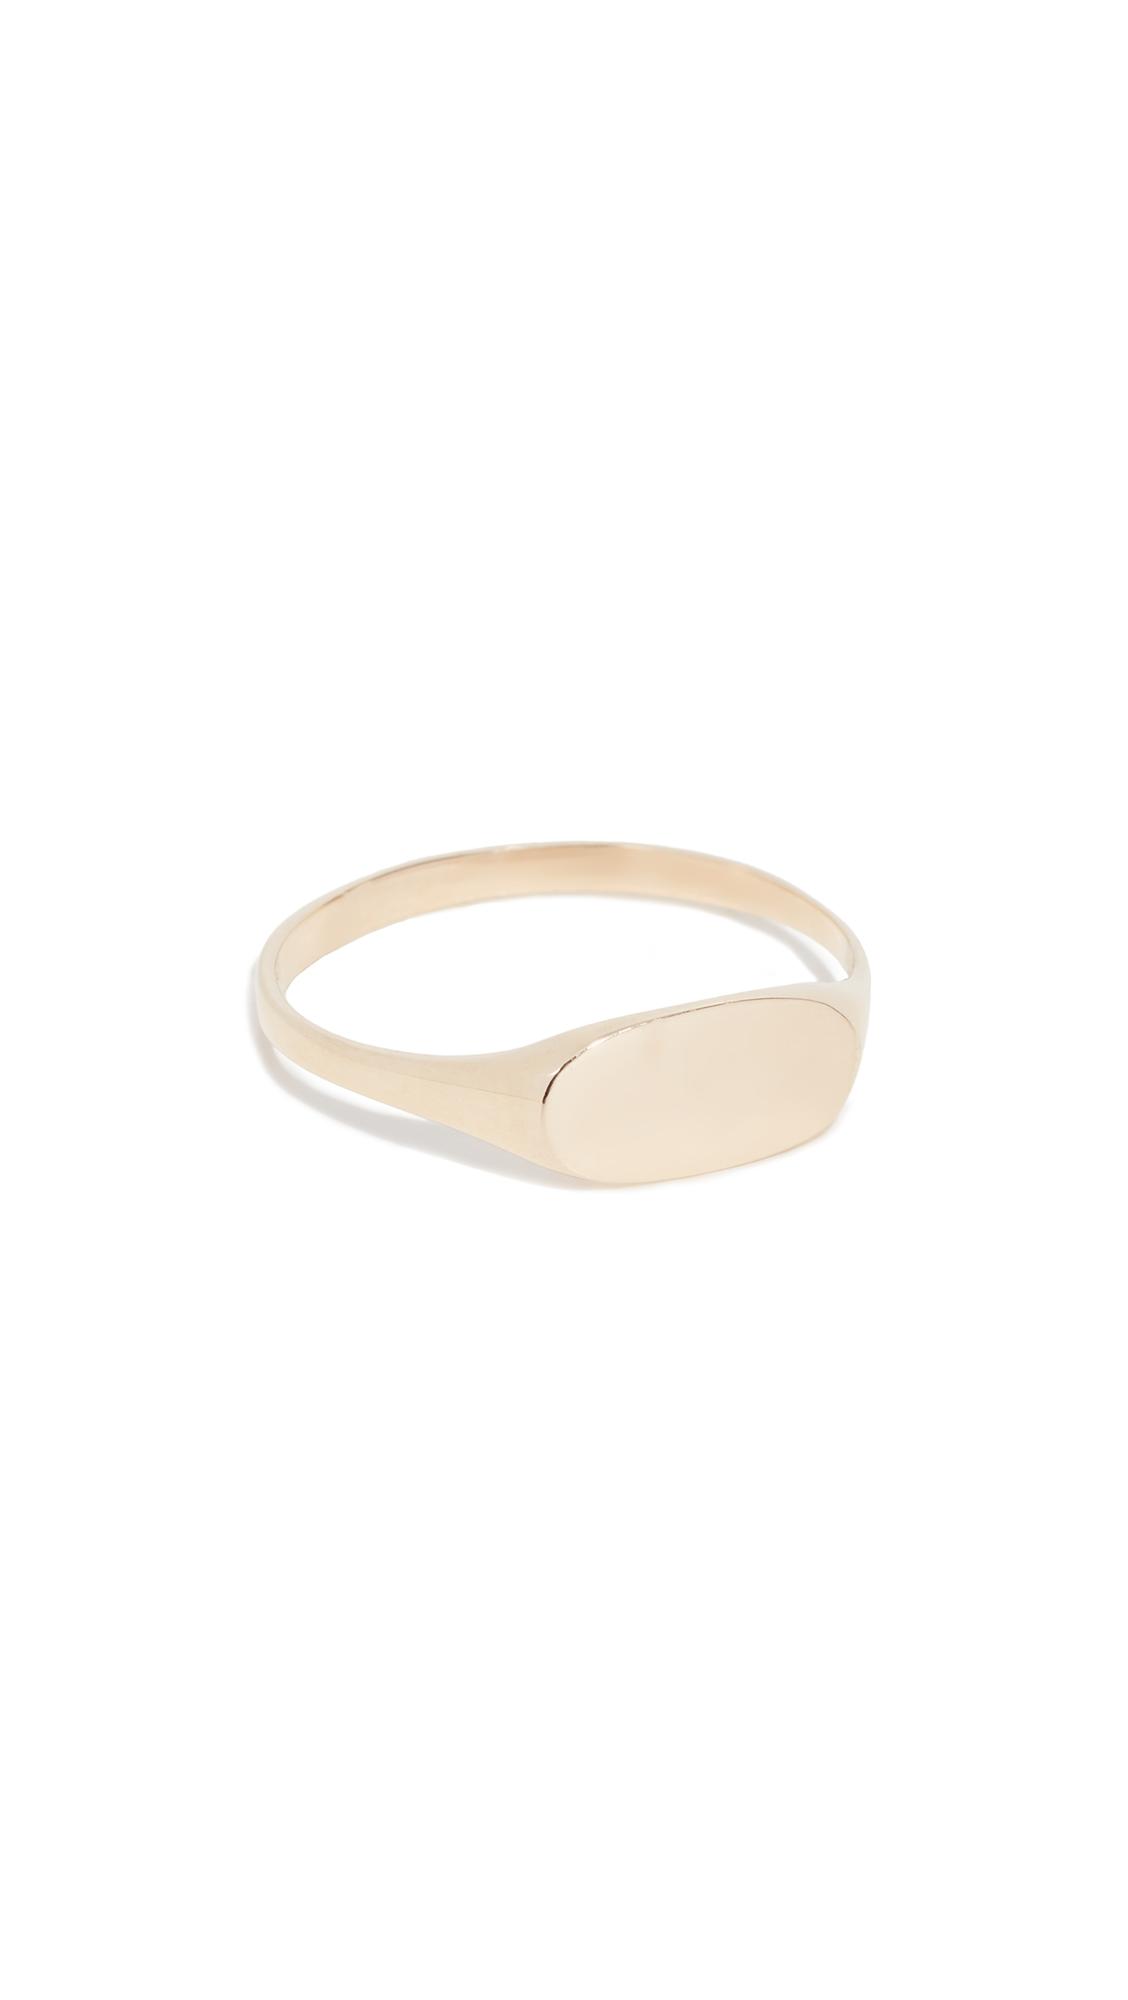 ARIEL GORDON JEWELRY 14K Petite Signet Ring in Yellow Gold